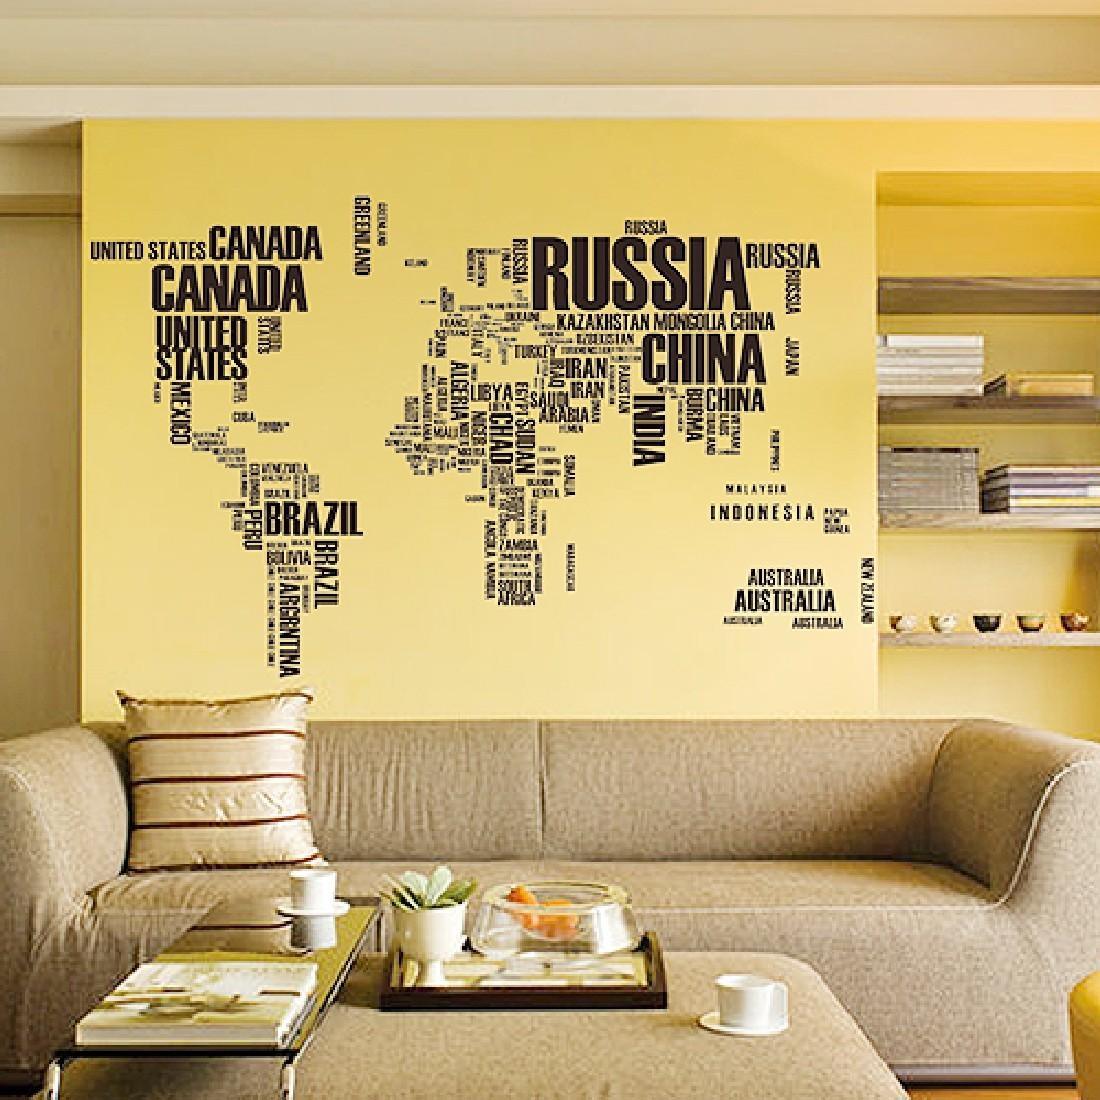 Popular Atlas Wall Art Buy Cheap Atlas Wall Art Lots From China In Atlas Wall Art (View 16 of 20)